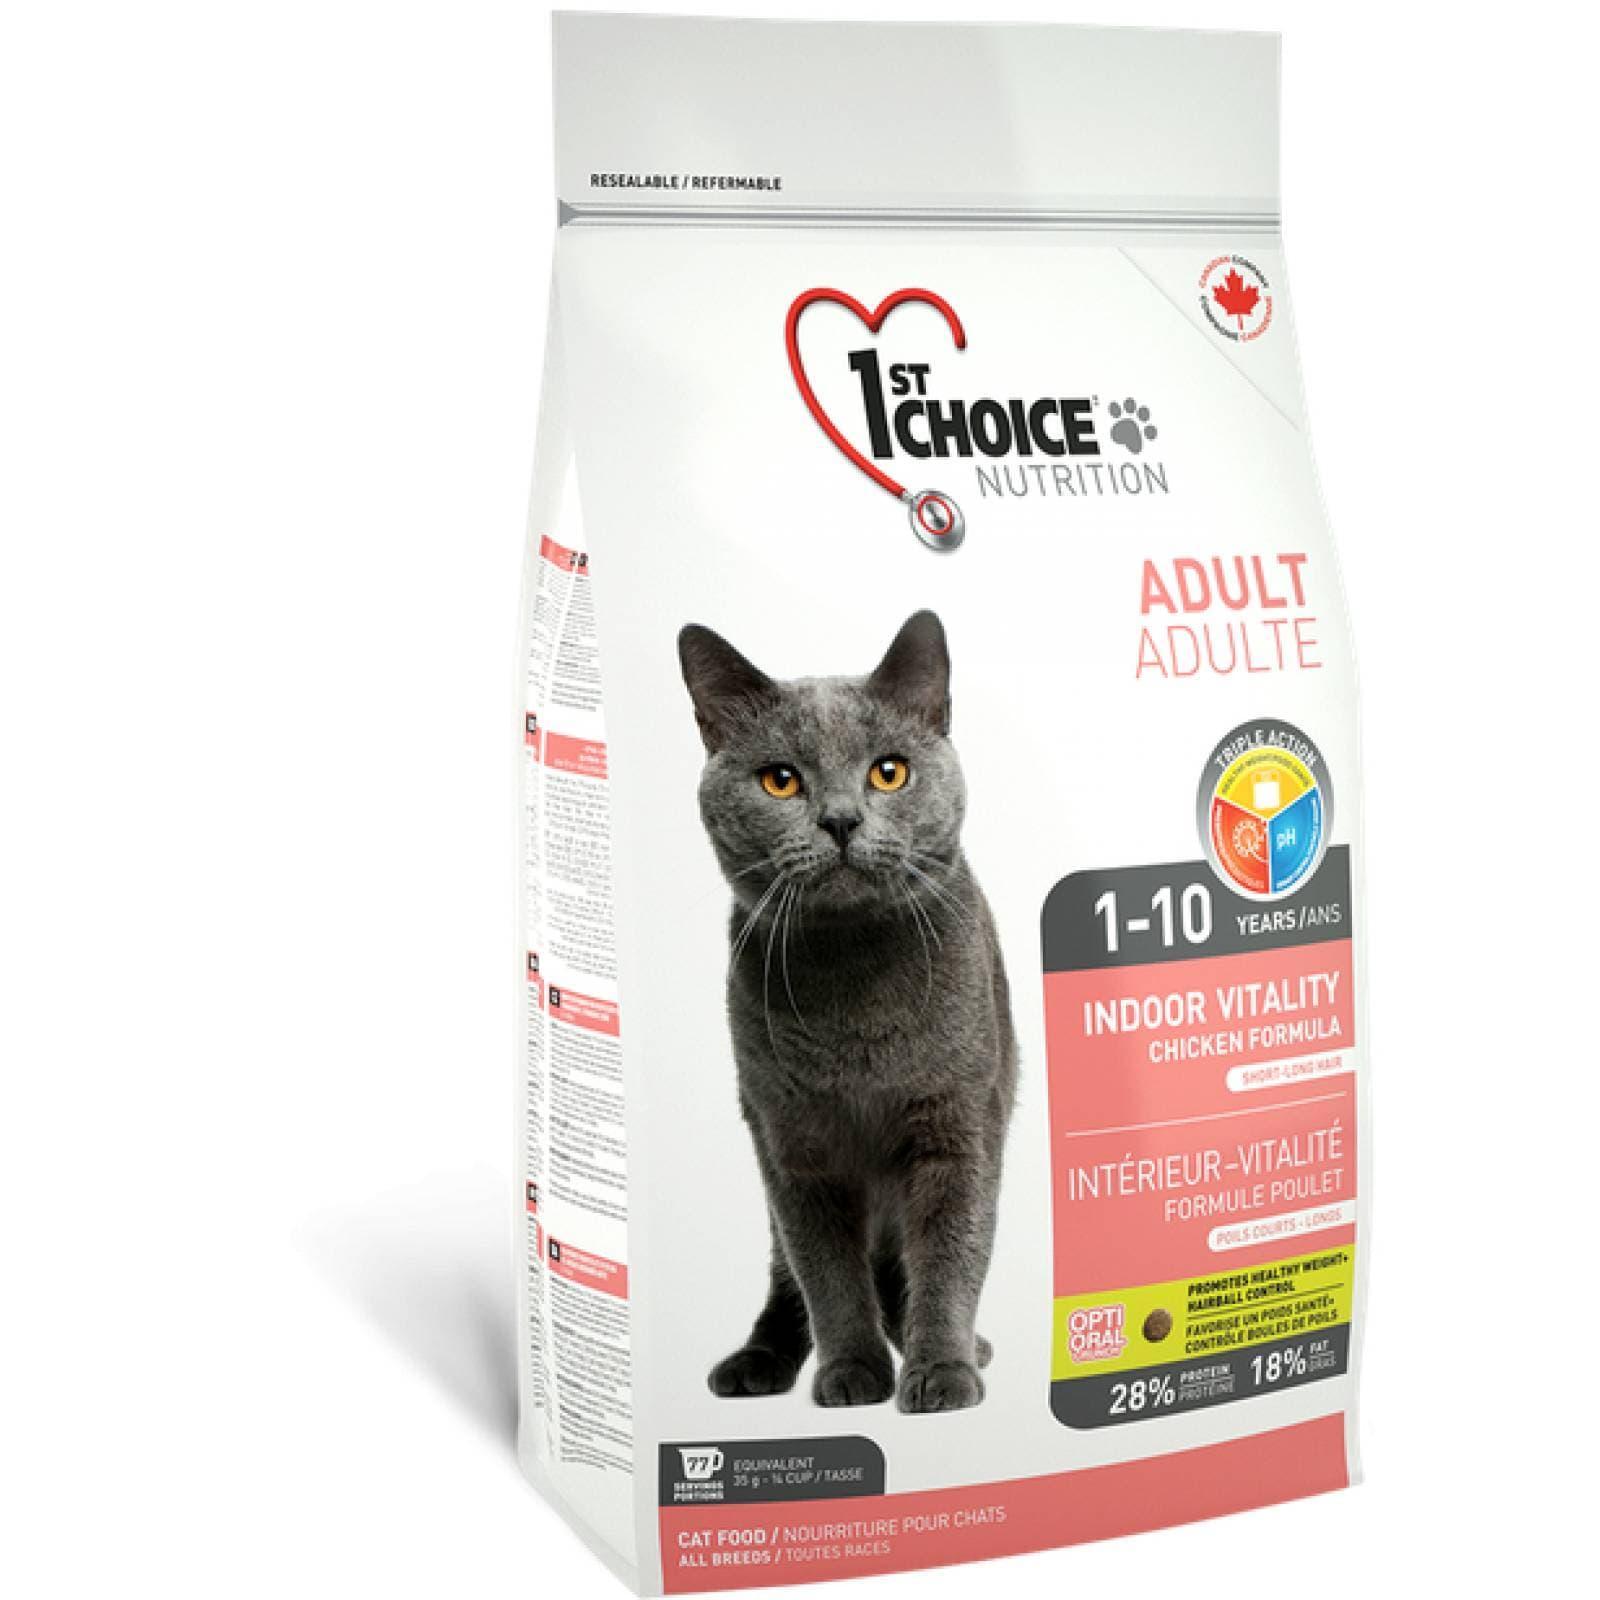 1st Choice Alimento para Gato Adulto Indoor Vitality Fórmula de pollo 10 kg